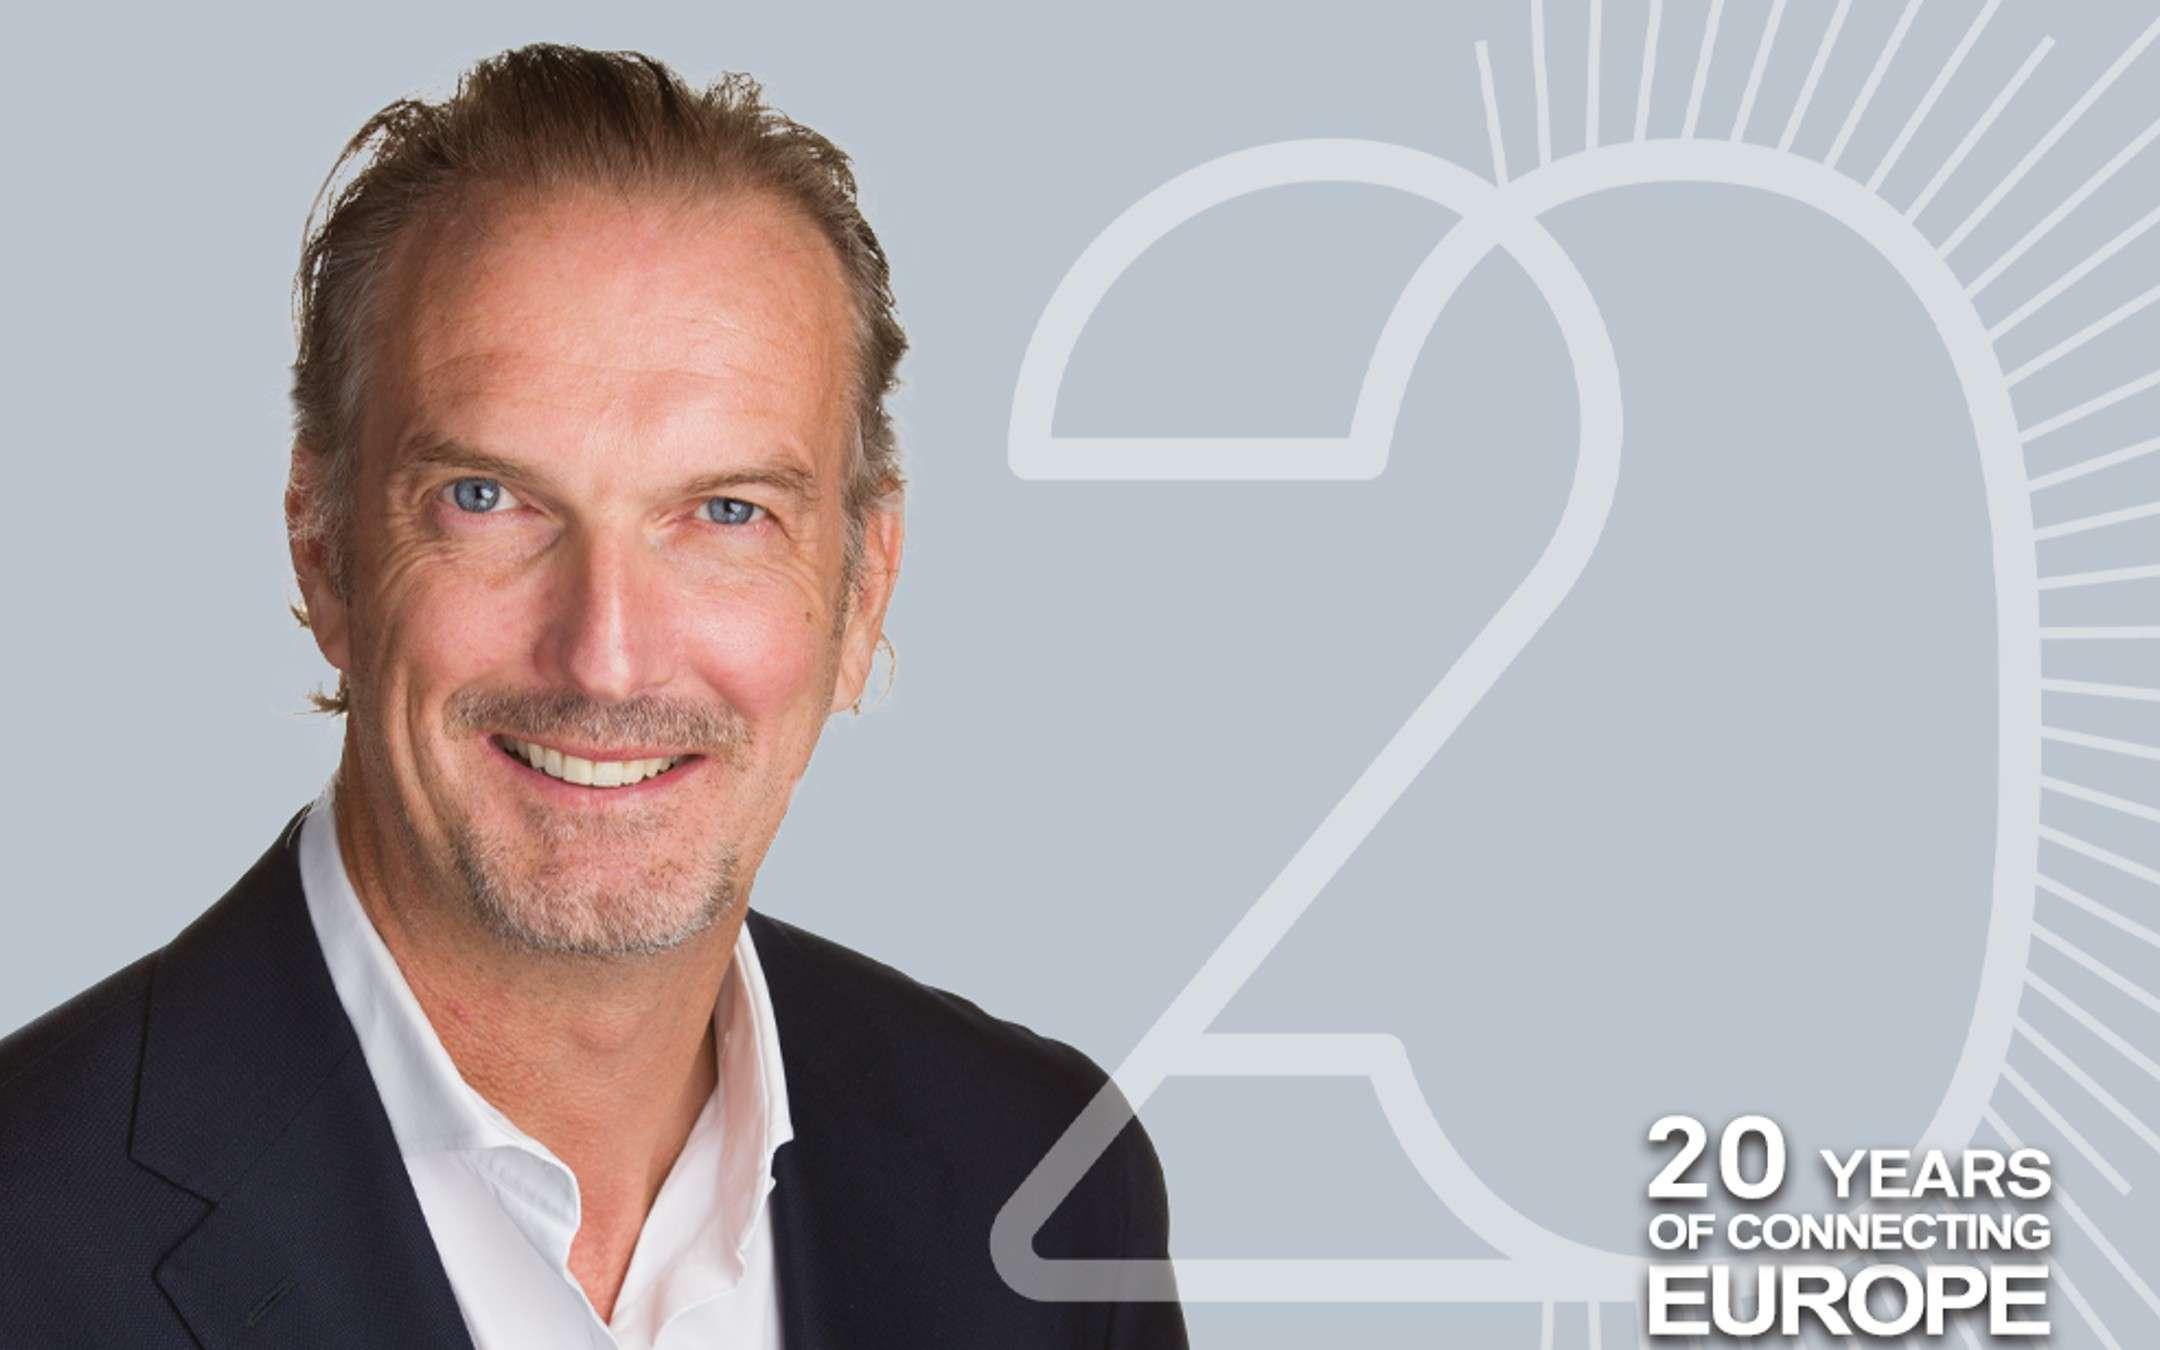 Hank Stokbroekx, GTS Director of Service Marketing, Enterprise Business Group, Huawei Technologies